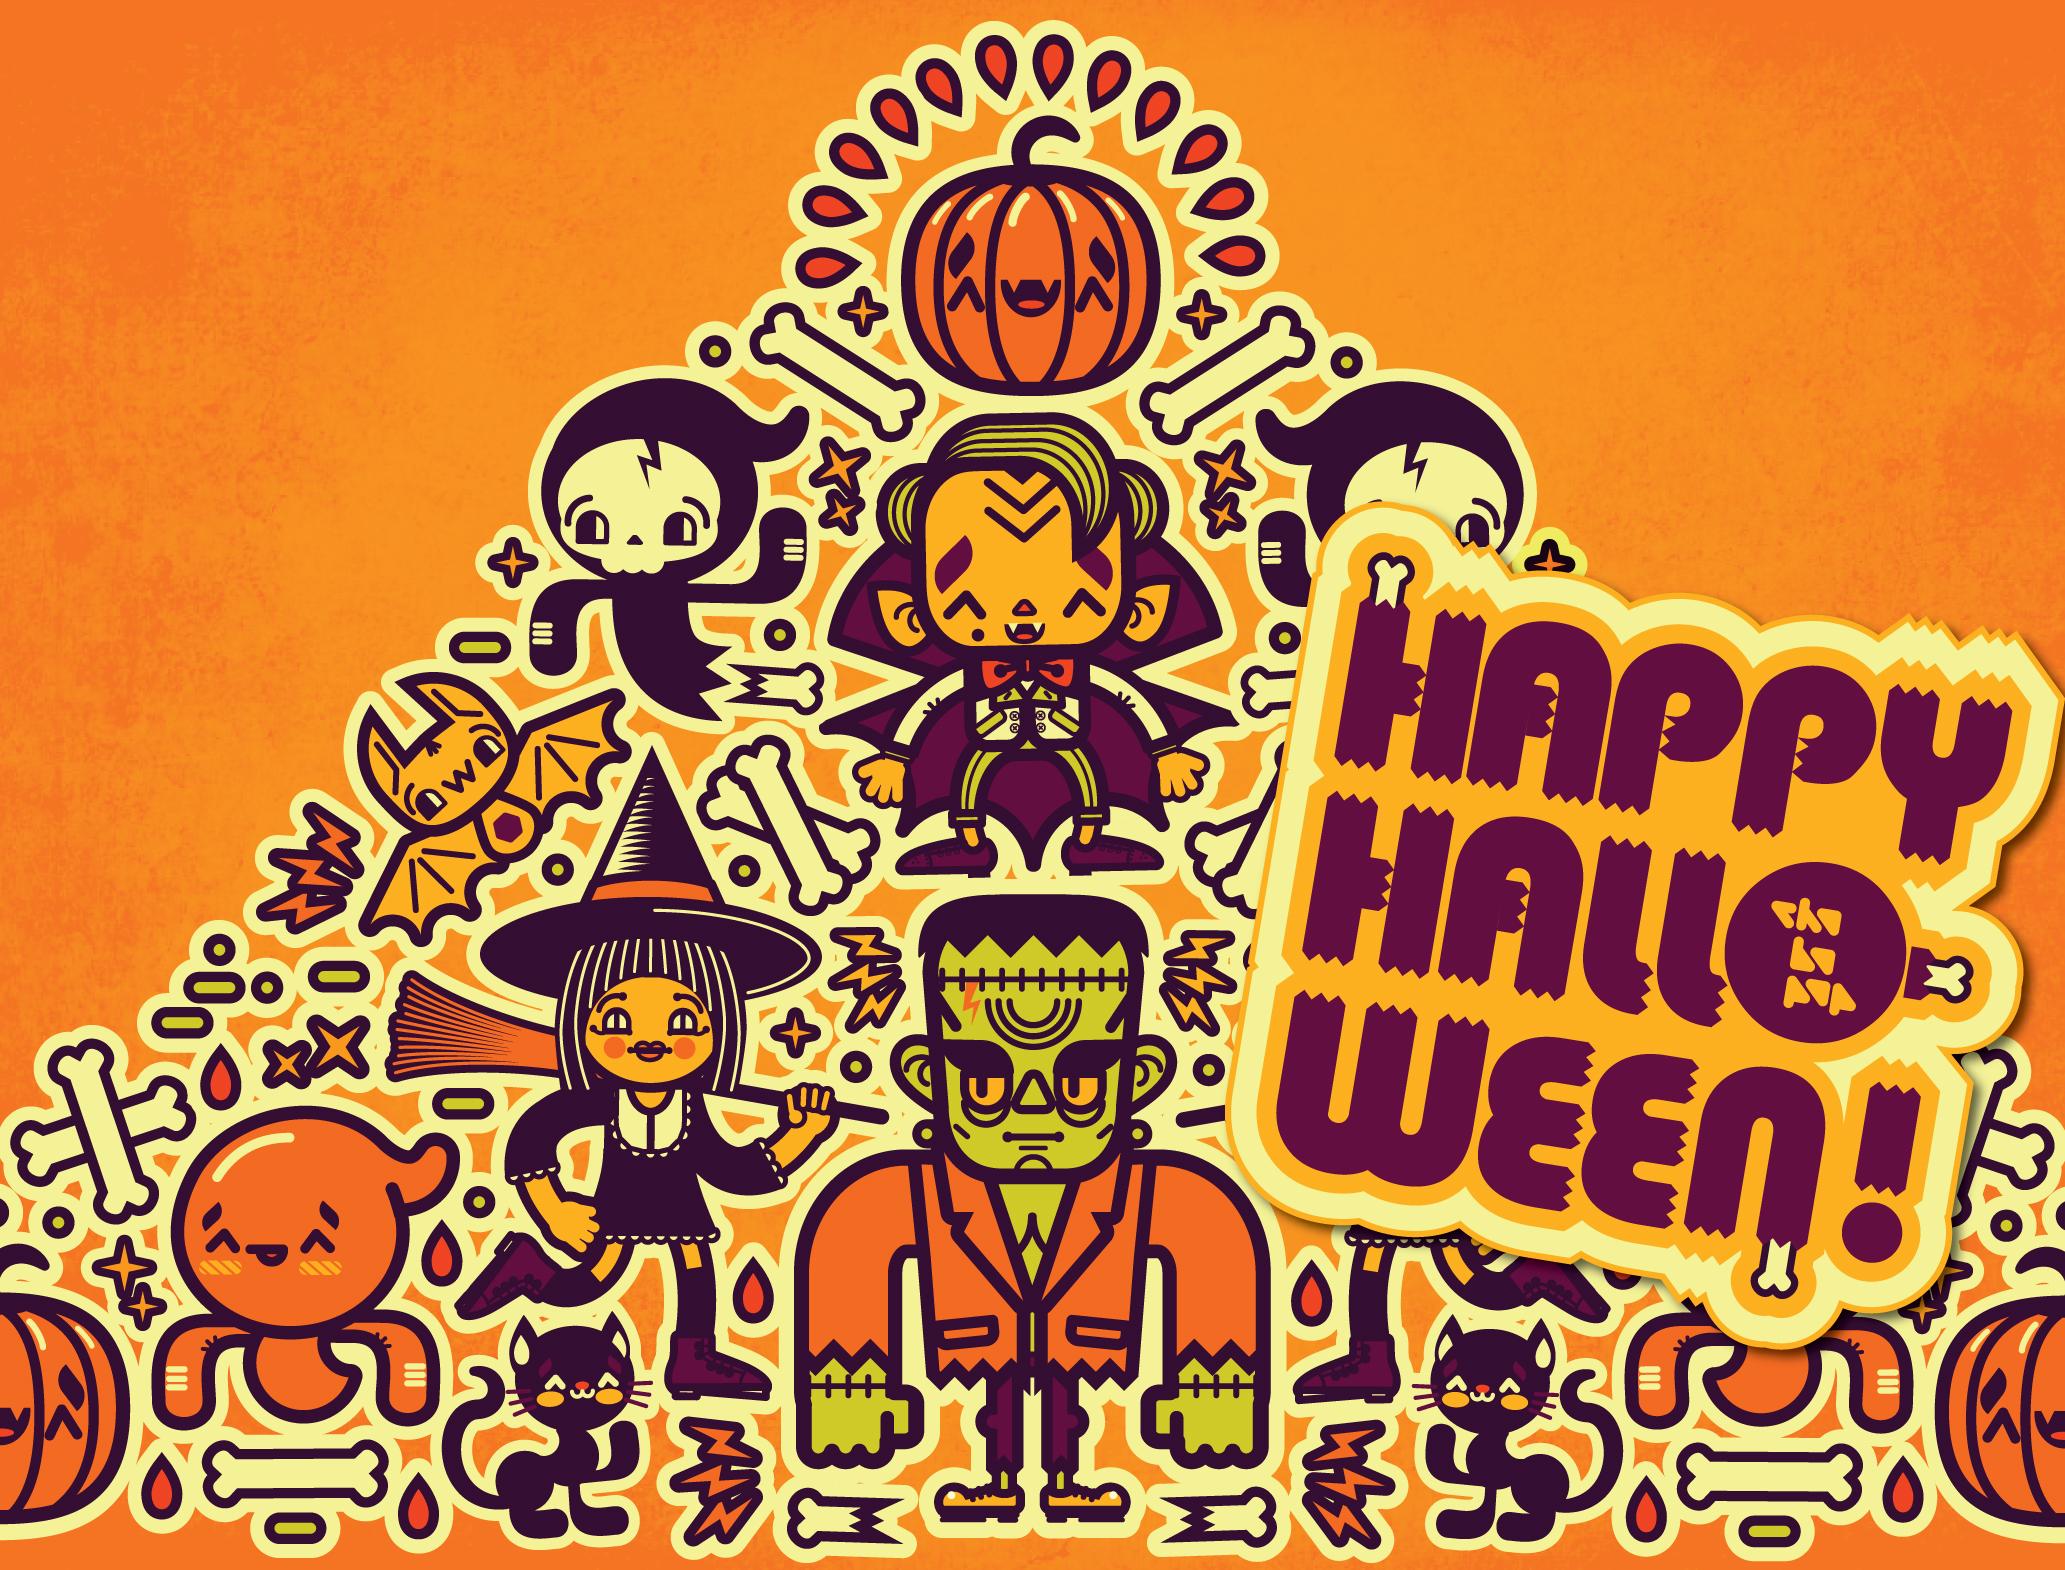 Wallpaper : illustration, cat, Halloween, pumpkin, text